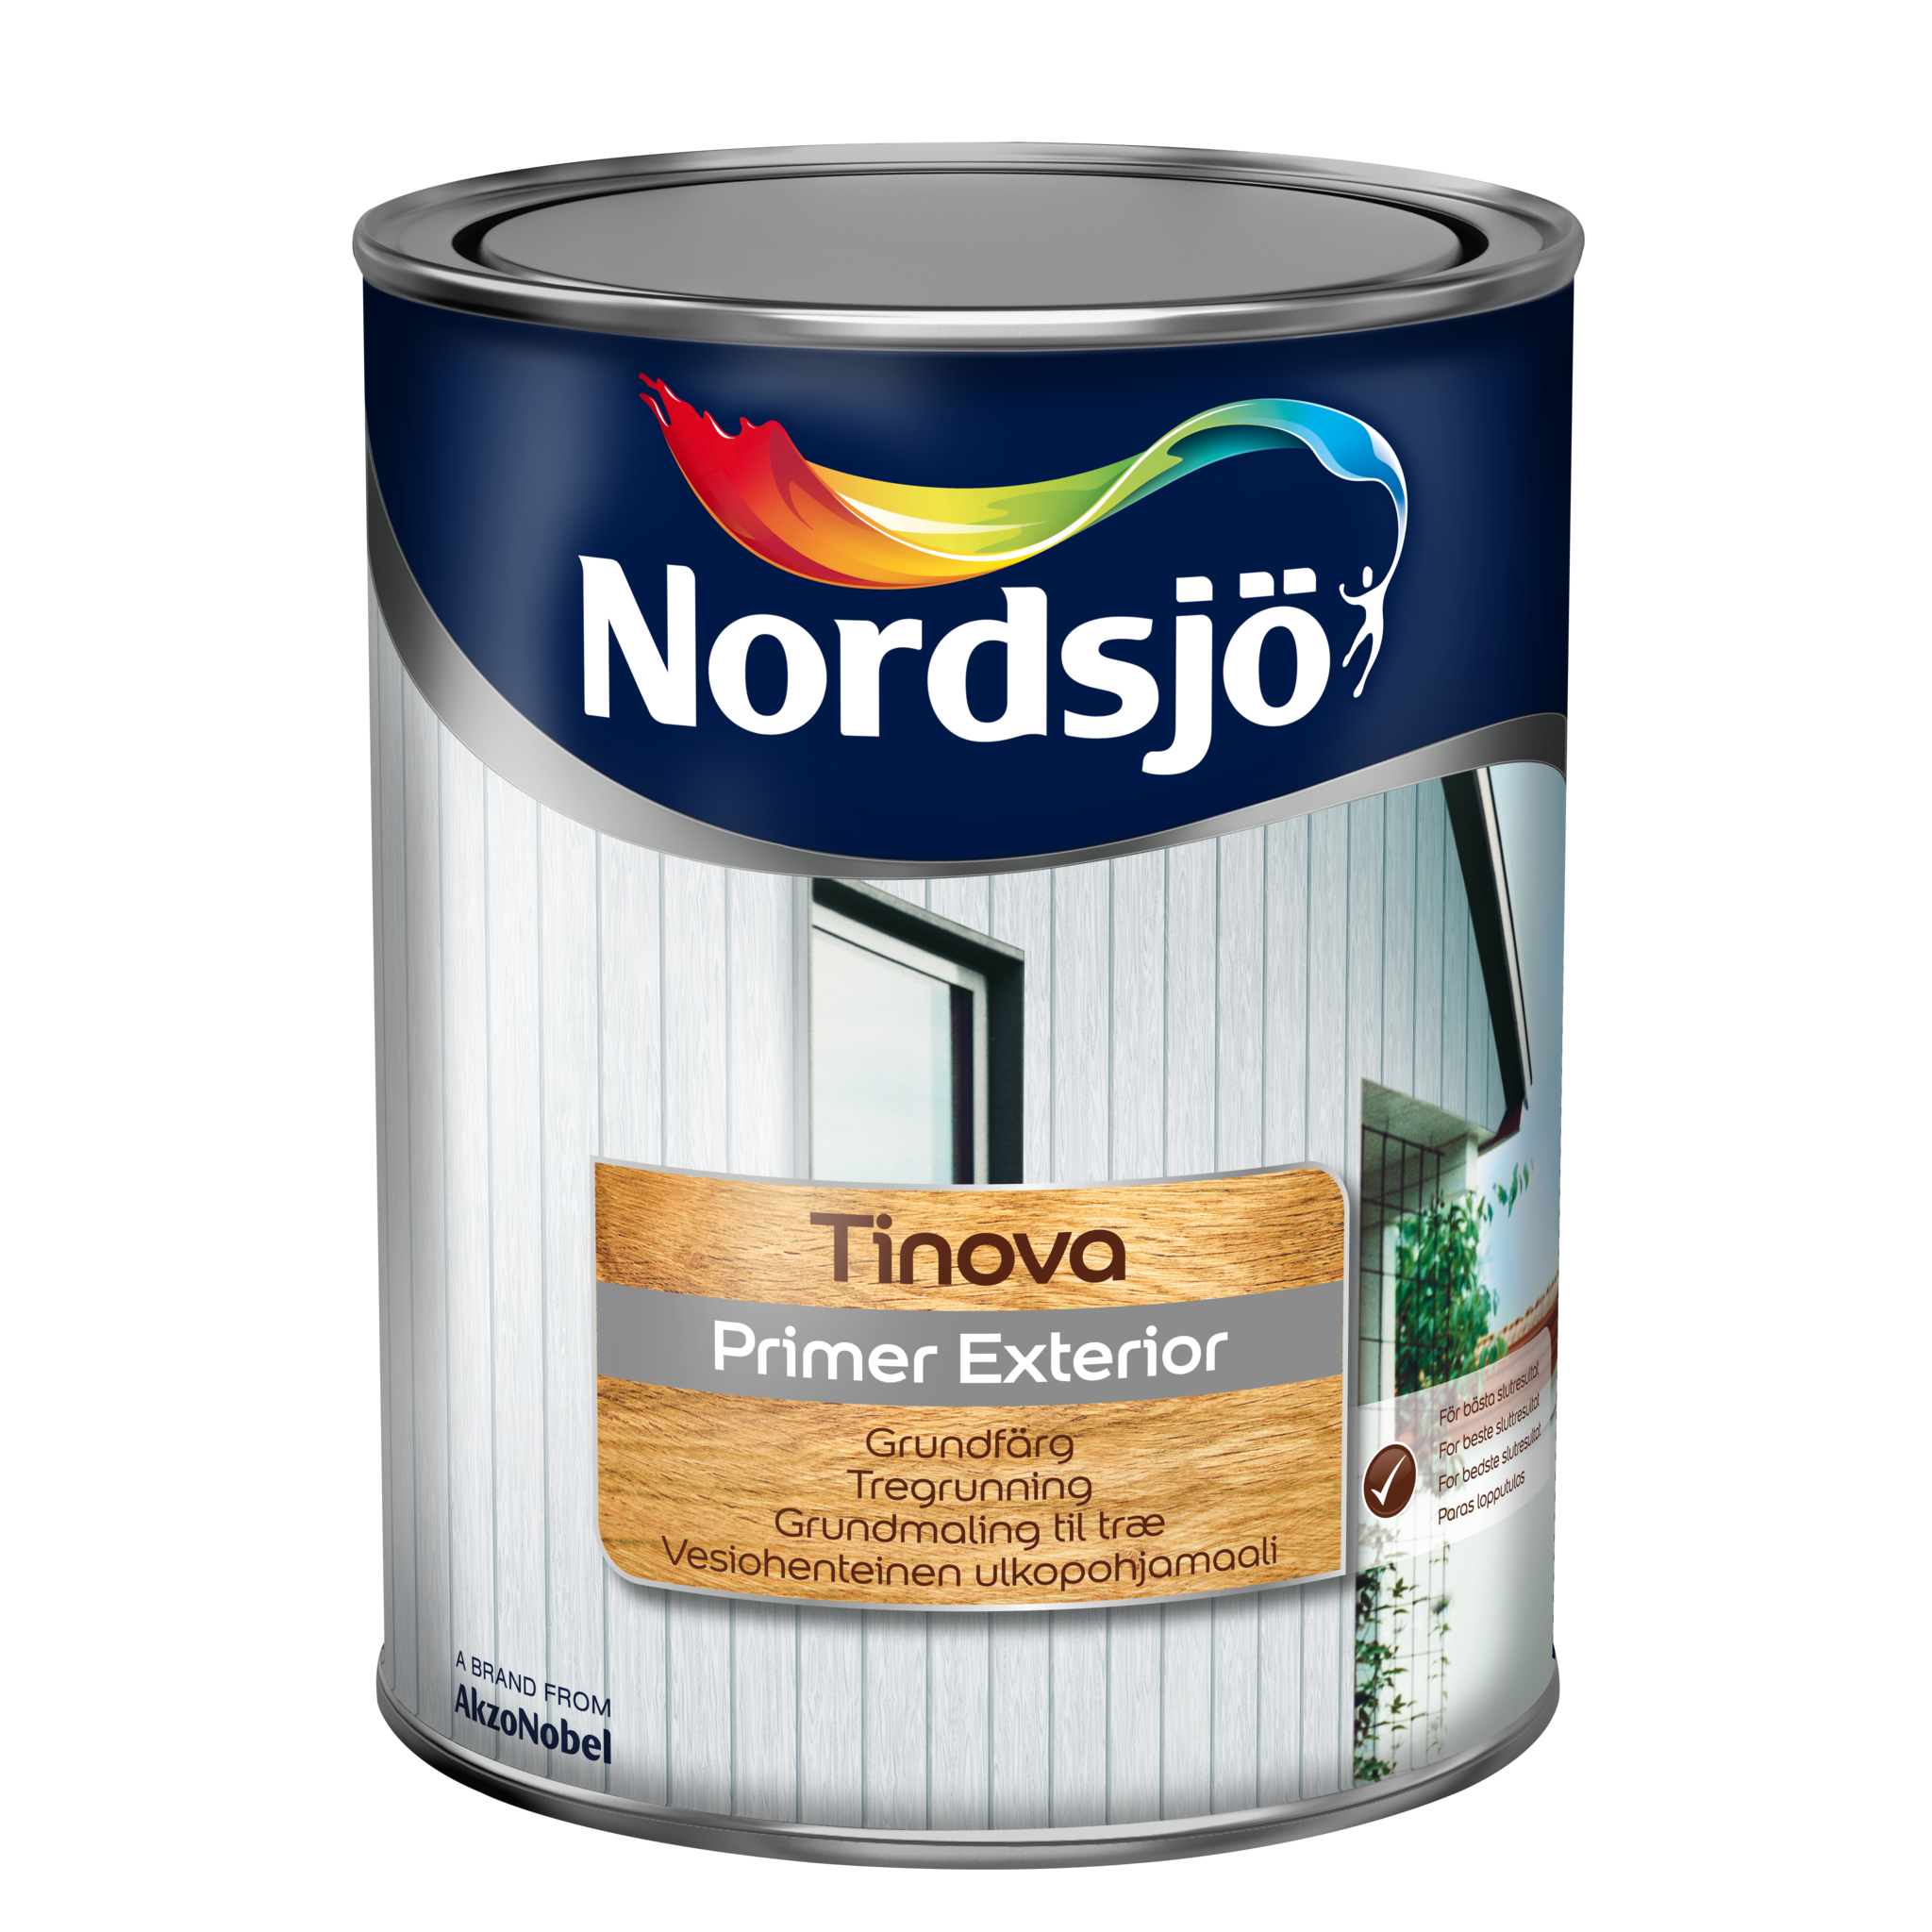 Nordsjo_Tinova-Primer-Exterior_1L_500